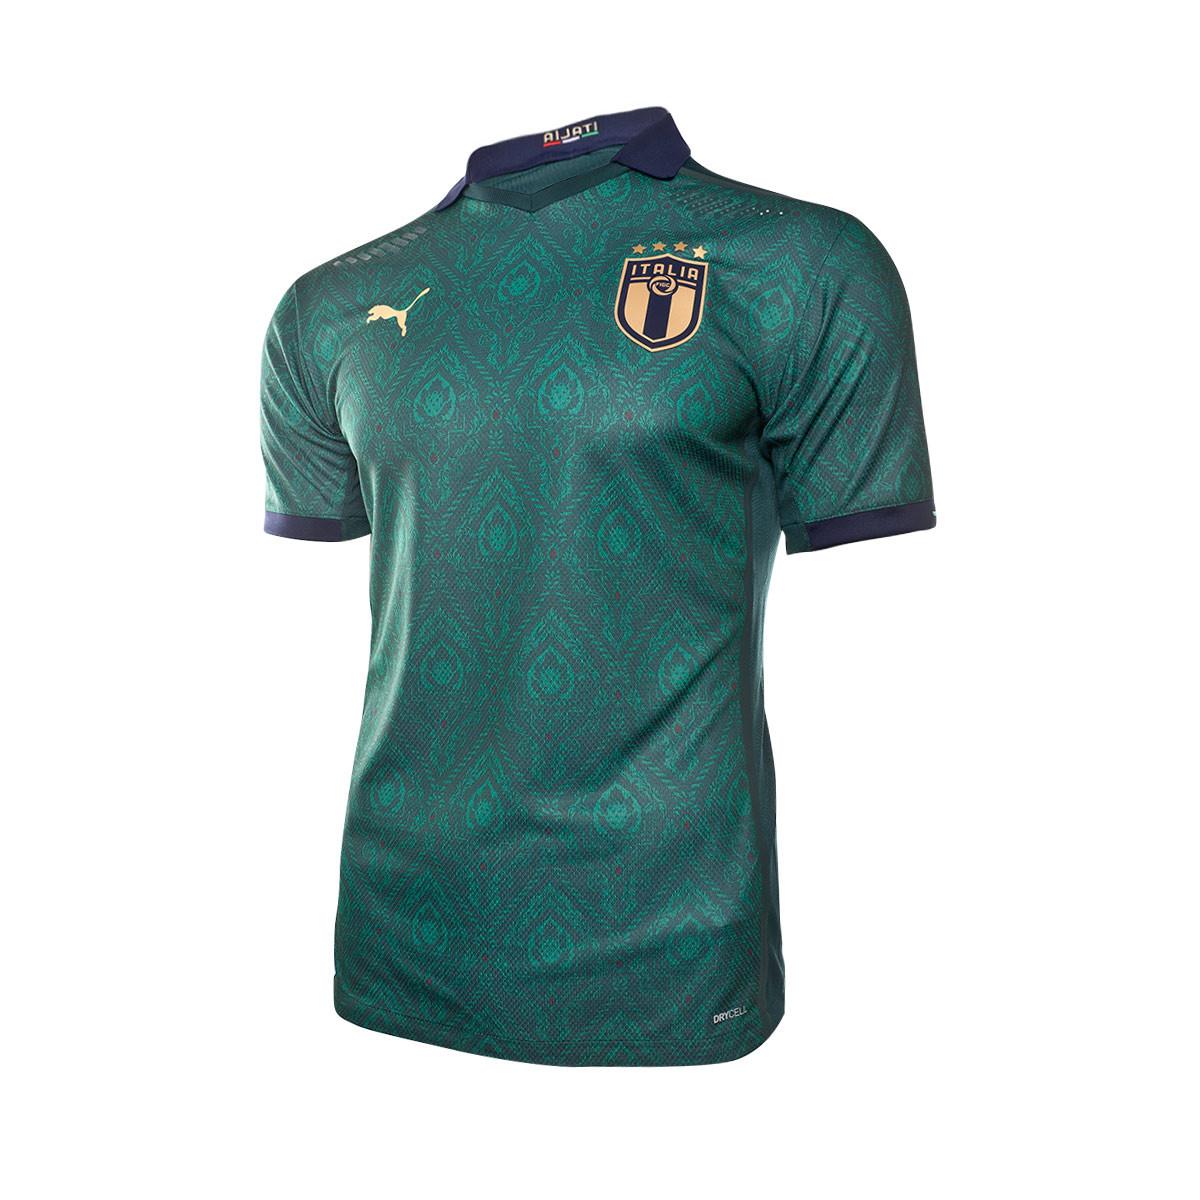 Puma Italia Tercera Promo 2019-2020 Jersey